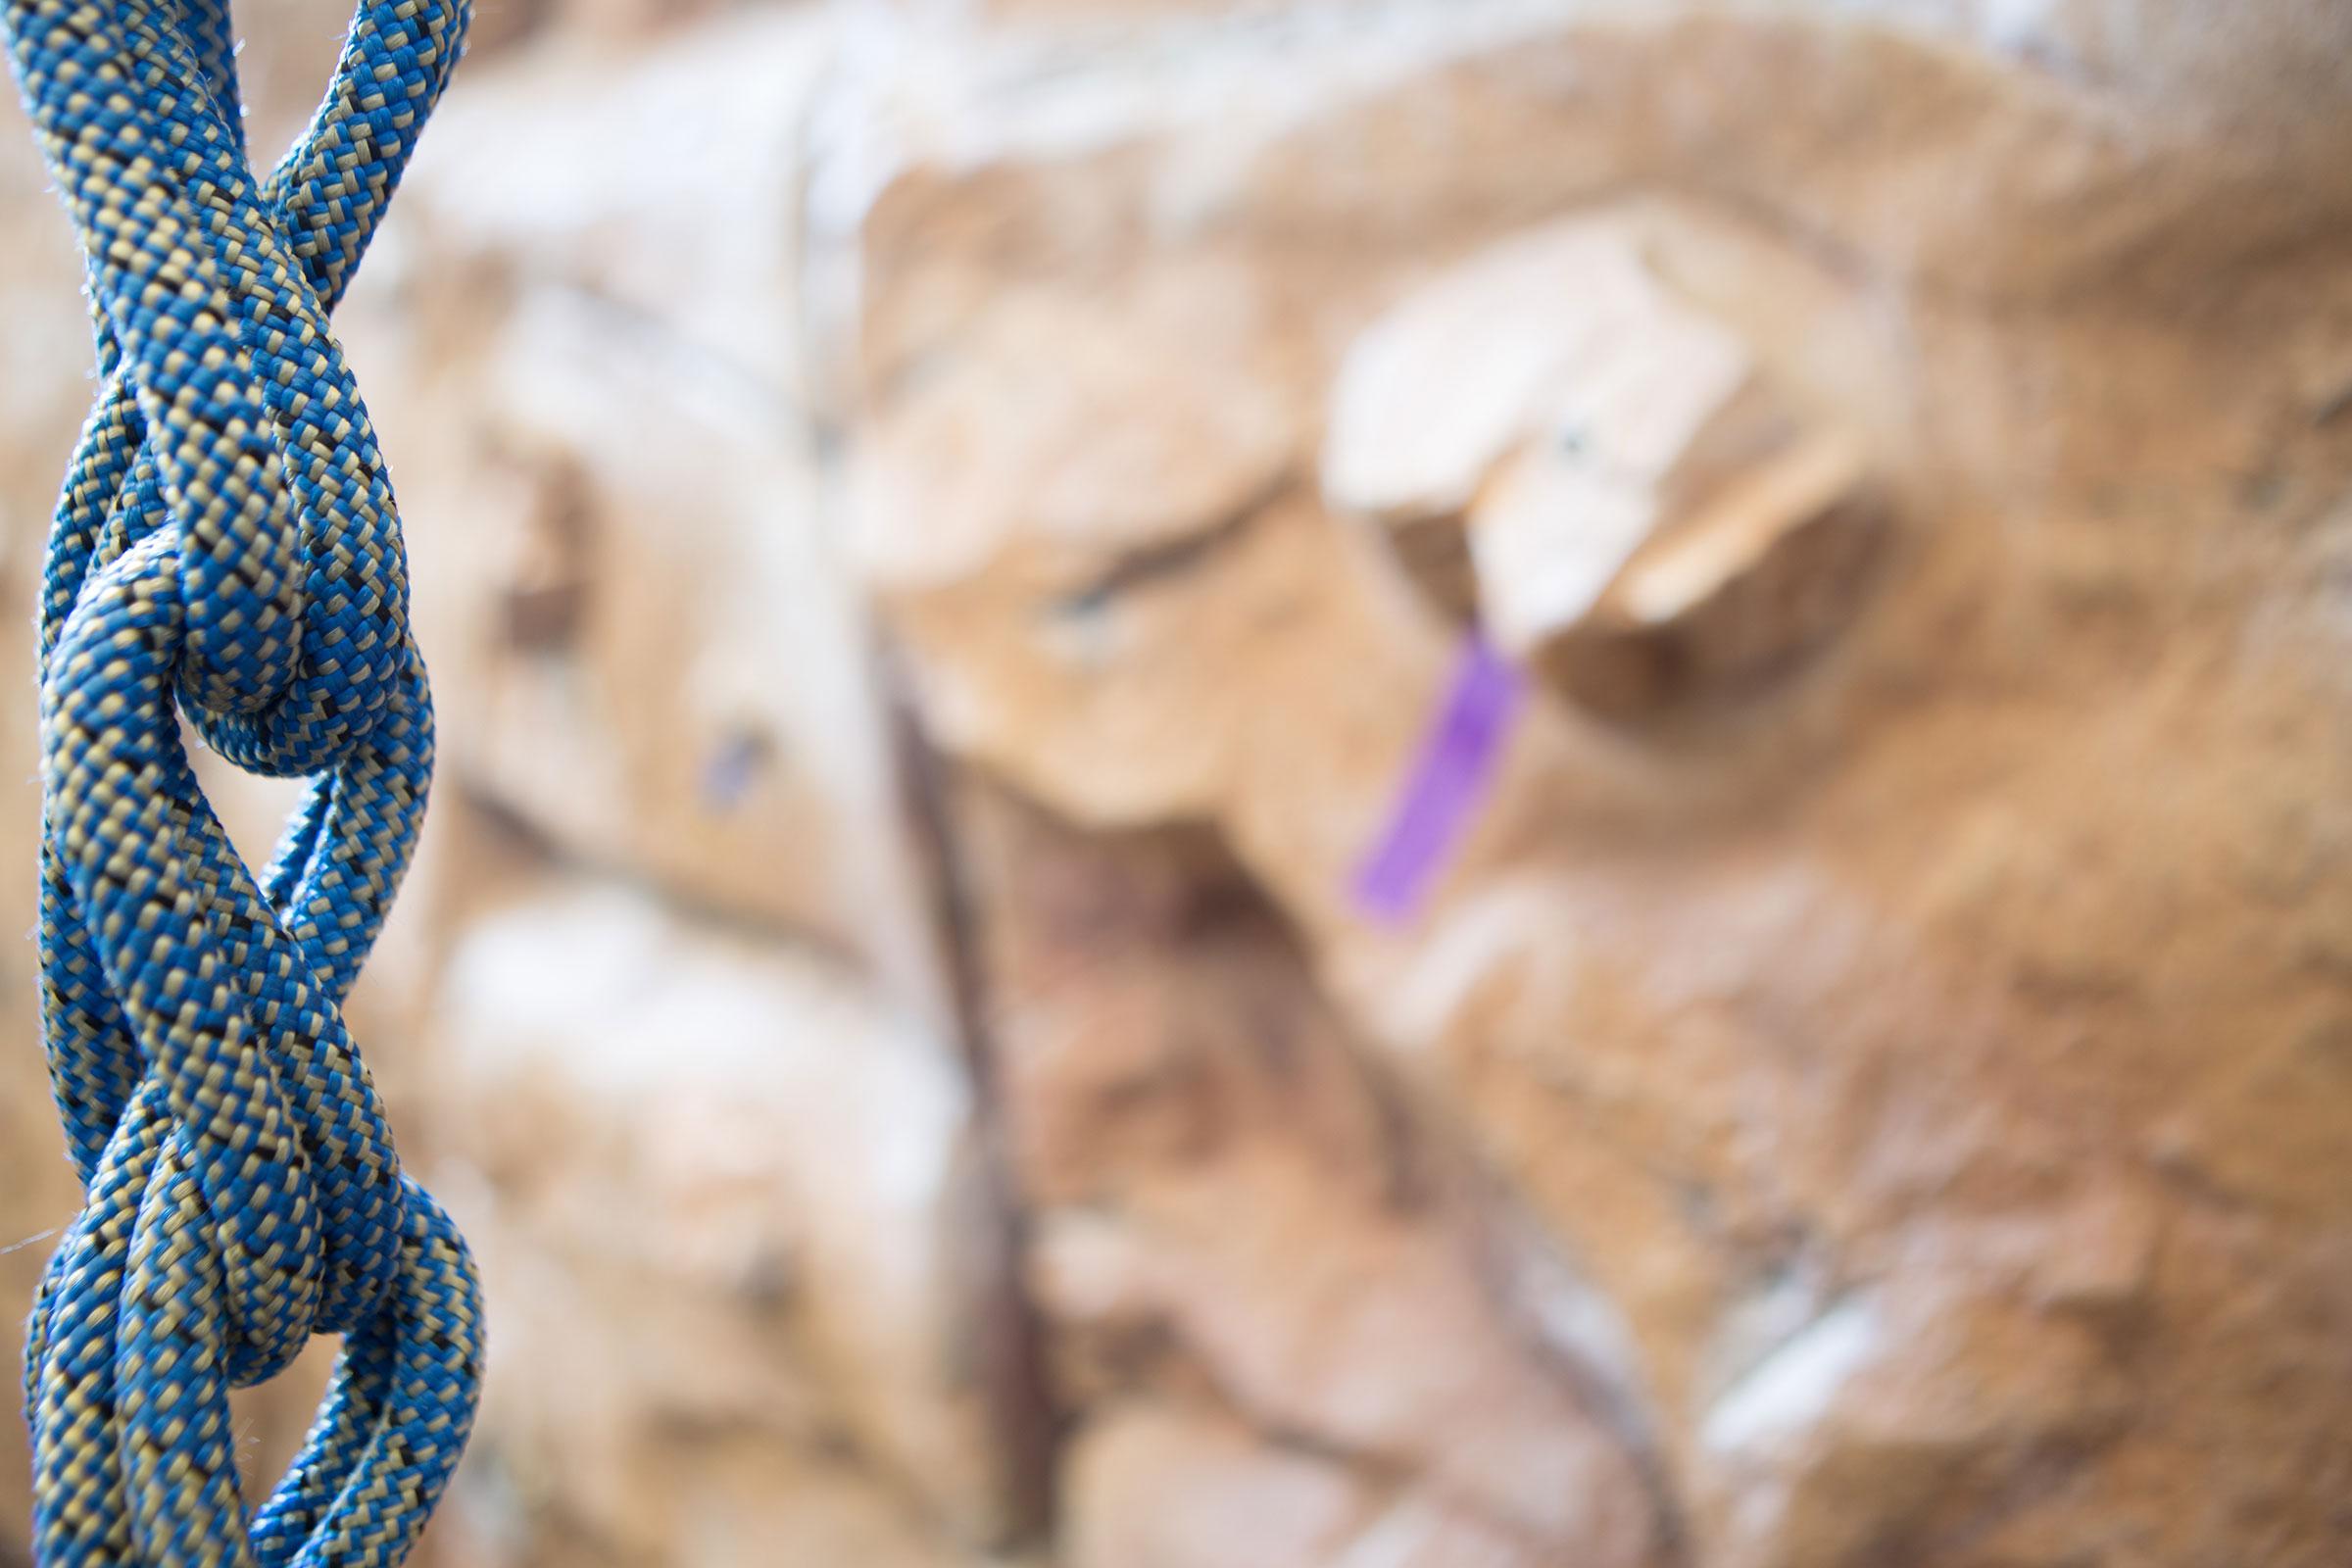 rock climbing wall and rope close up